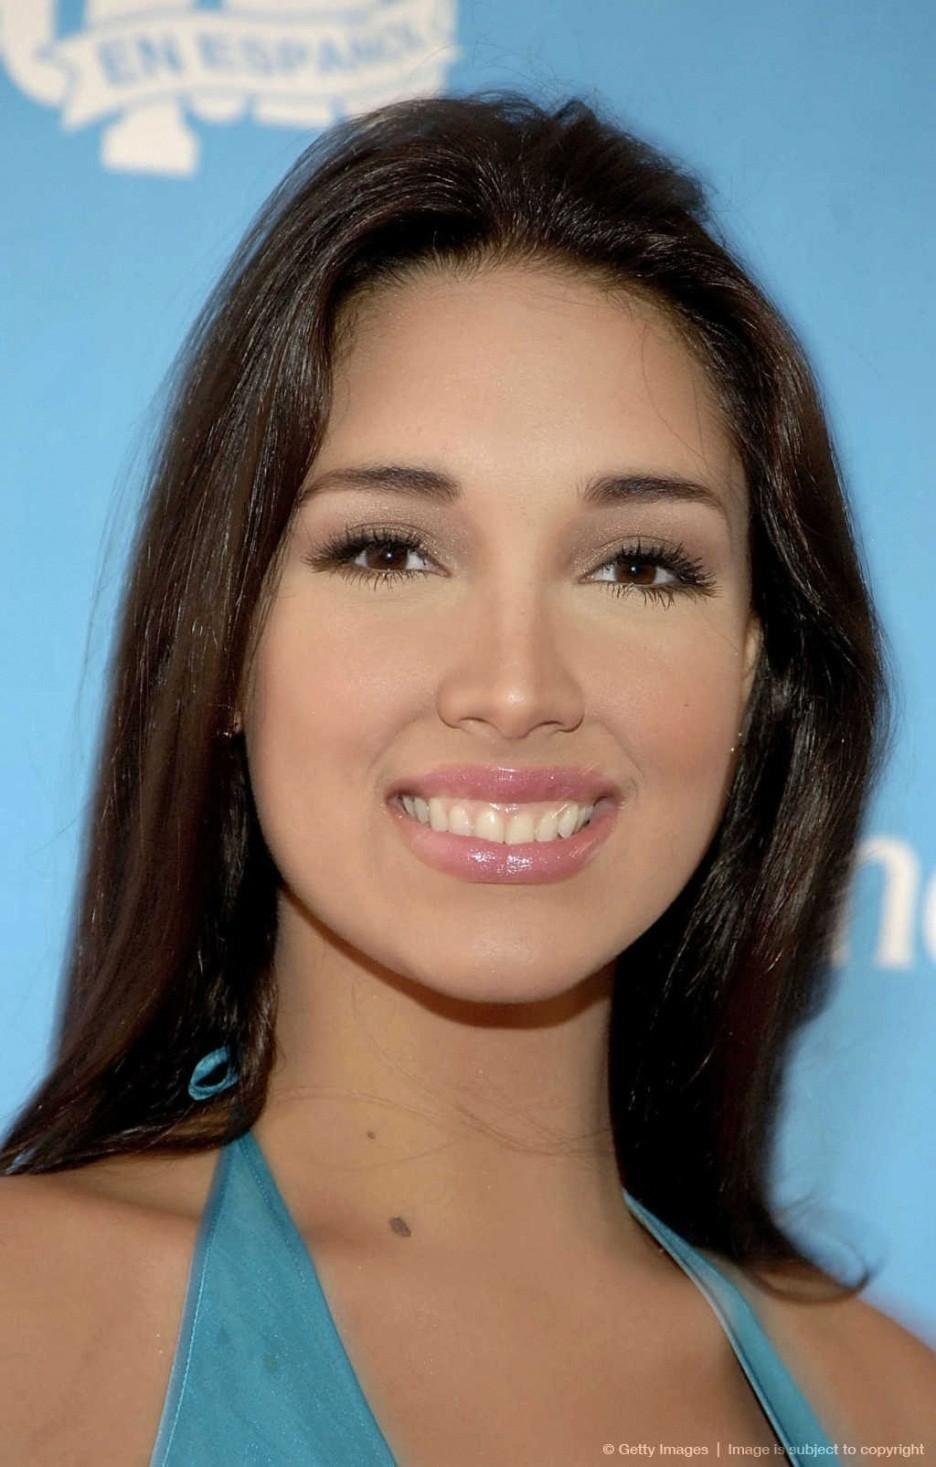 ════ ∘◦❁◦∘ ════ Amelia Vega, Miss Universe 2003. ════ ∘◦❁◦∘ ════ - Página 6 Full-a21